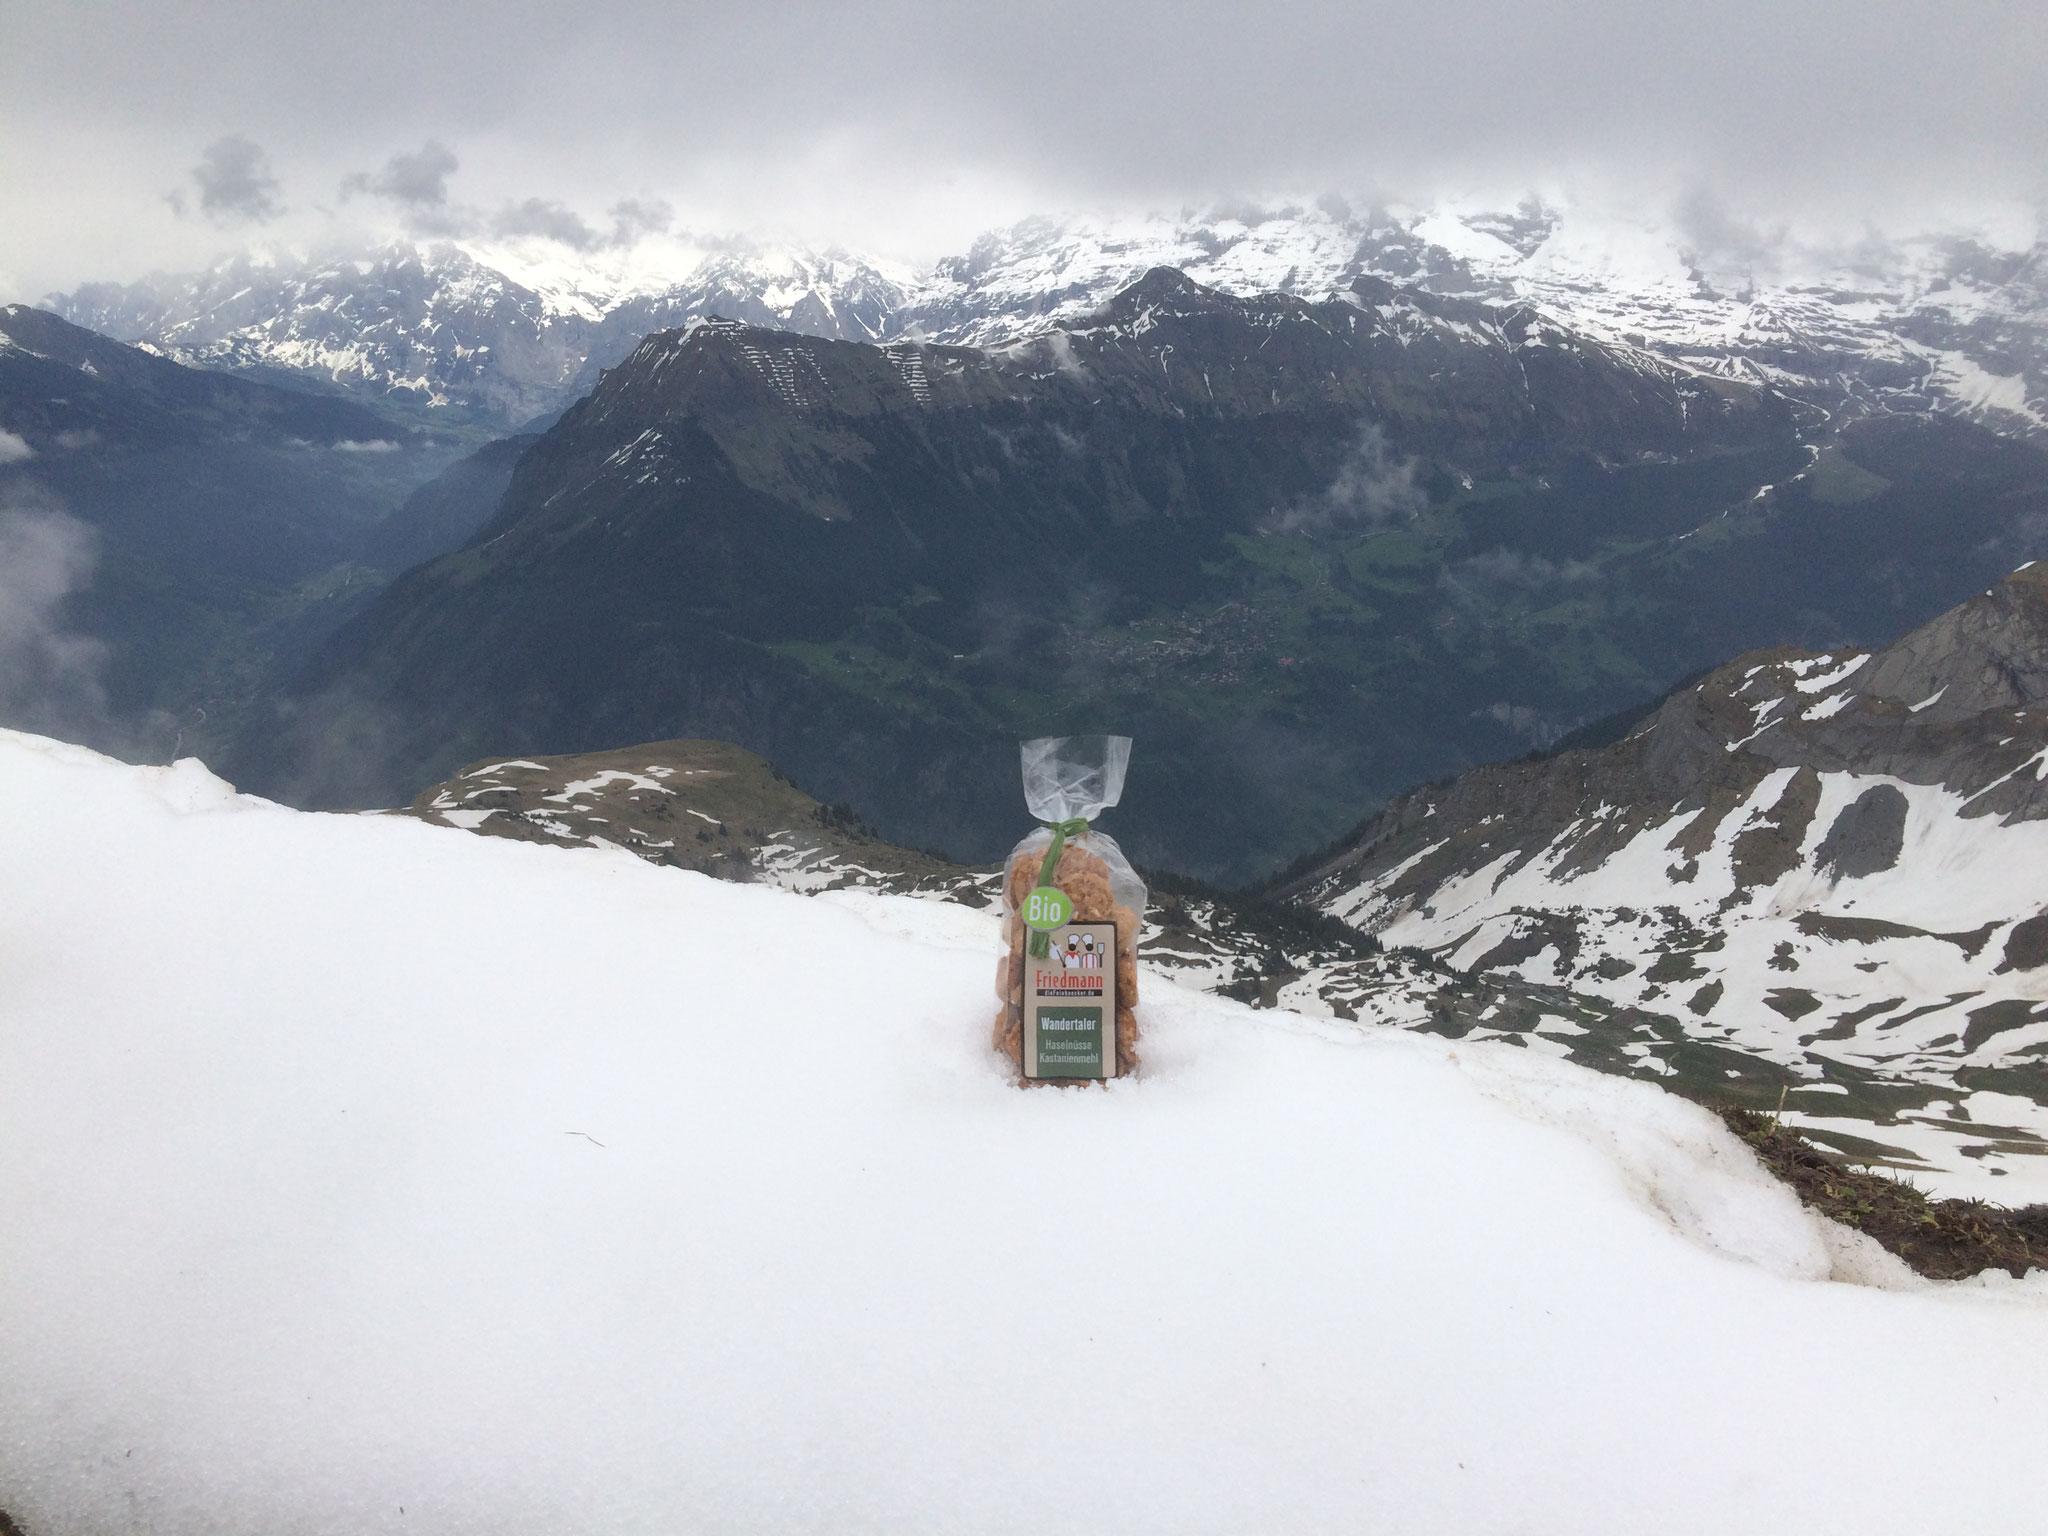 Europa Schweiz Berner Oberland am Suleck 2018